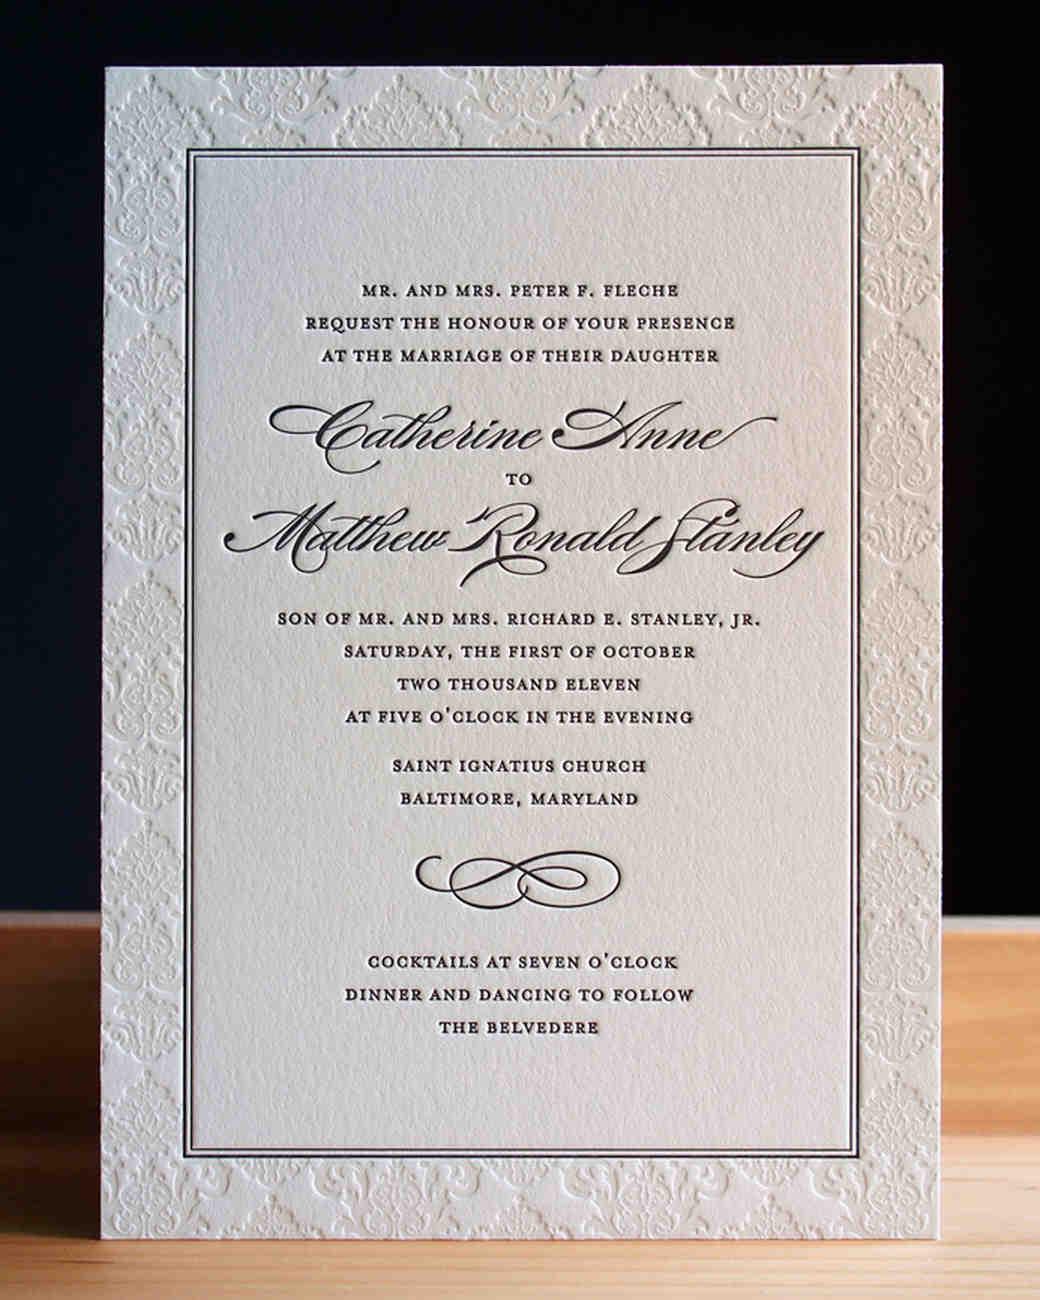 Beautiful Invitations For A Wedding Photos - Invitations Design ...